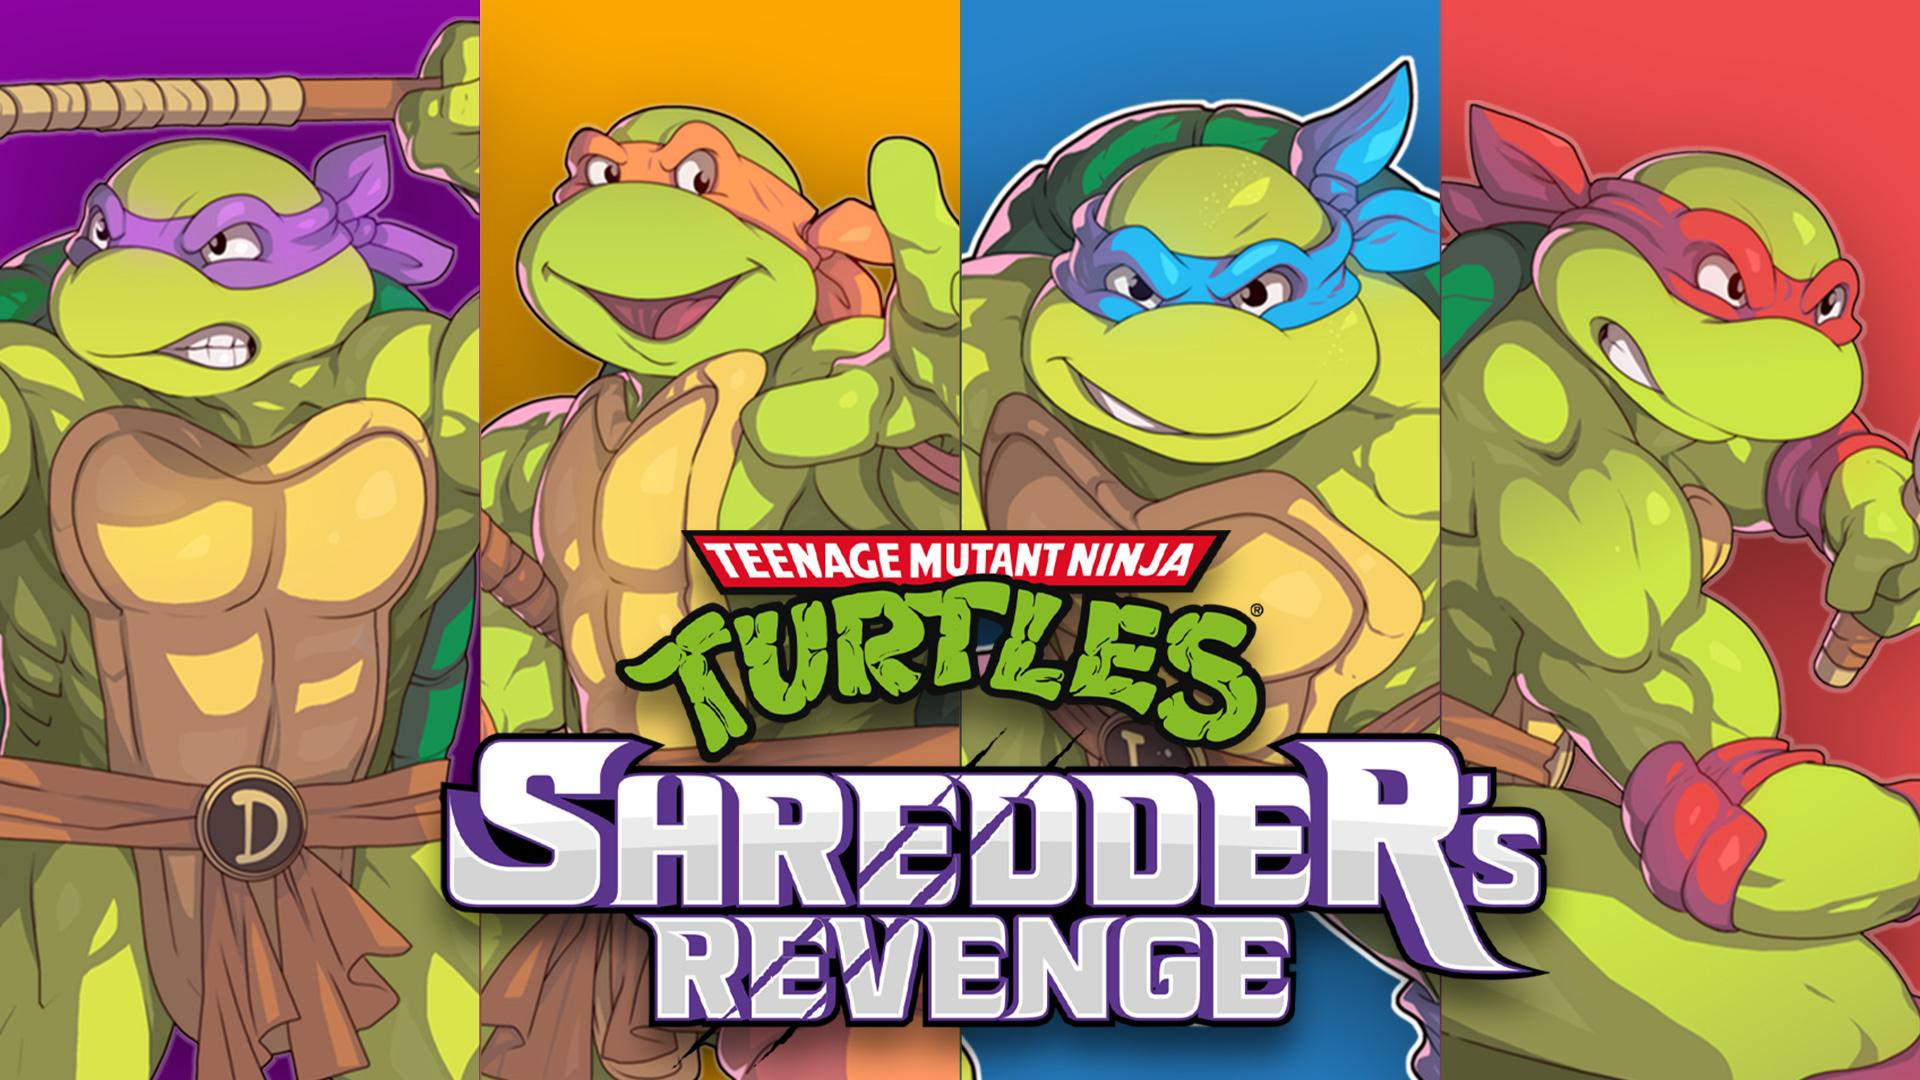 Teenage Mutant Ninja Turtles: Shredder's Revenge is coming to Nintendo Switch!